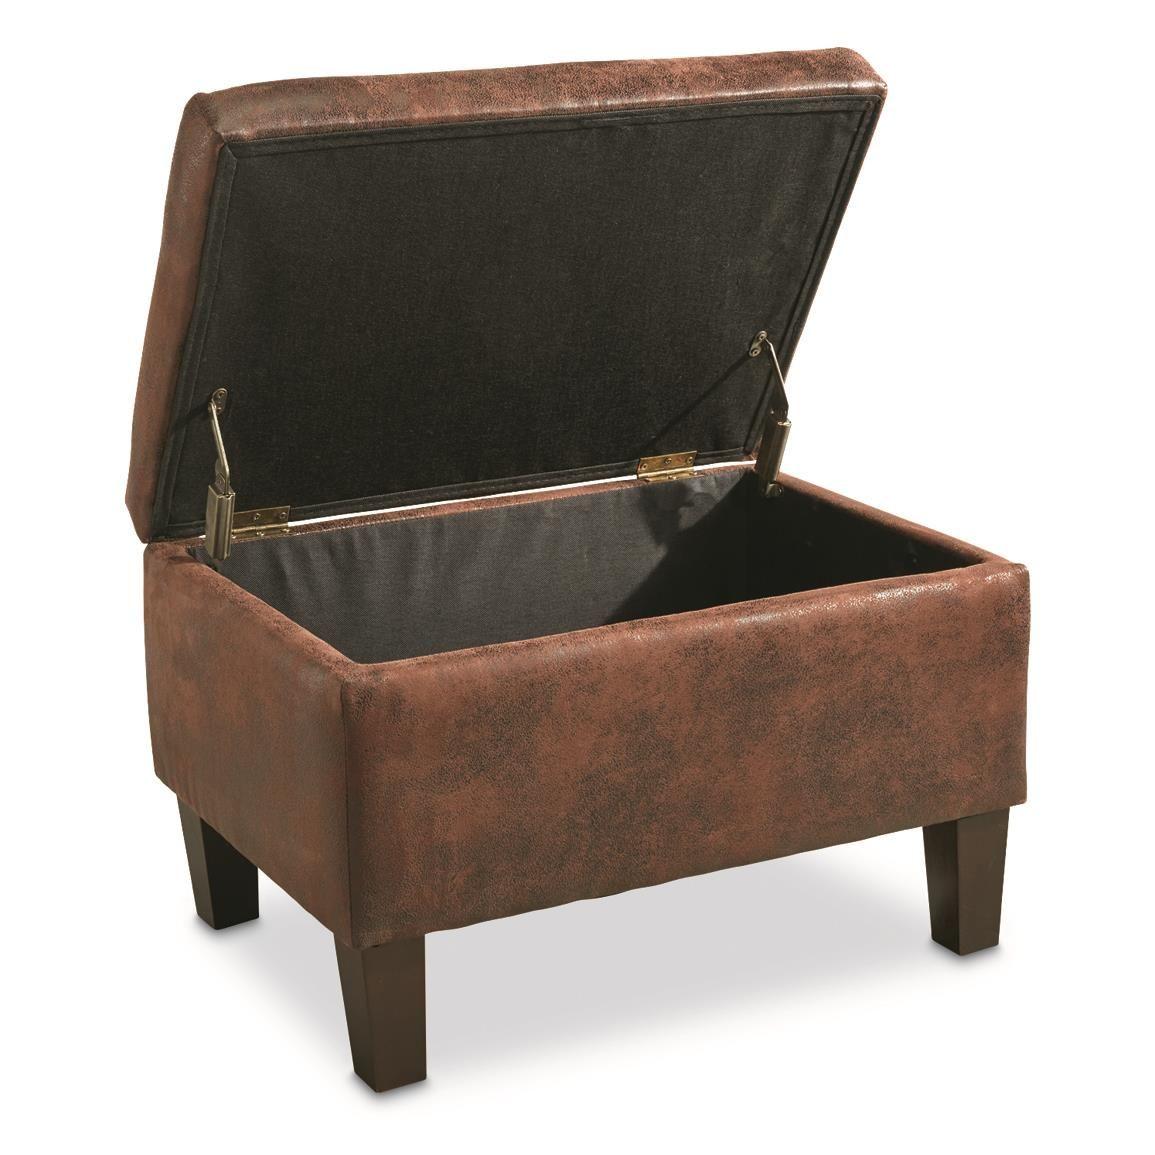 Castlecreek Concealment Ottoman Microfiber Storage Ottoman Bench Modern Footstool